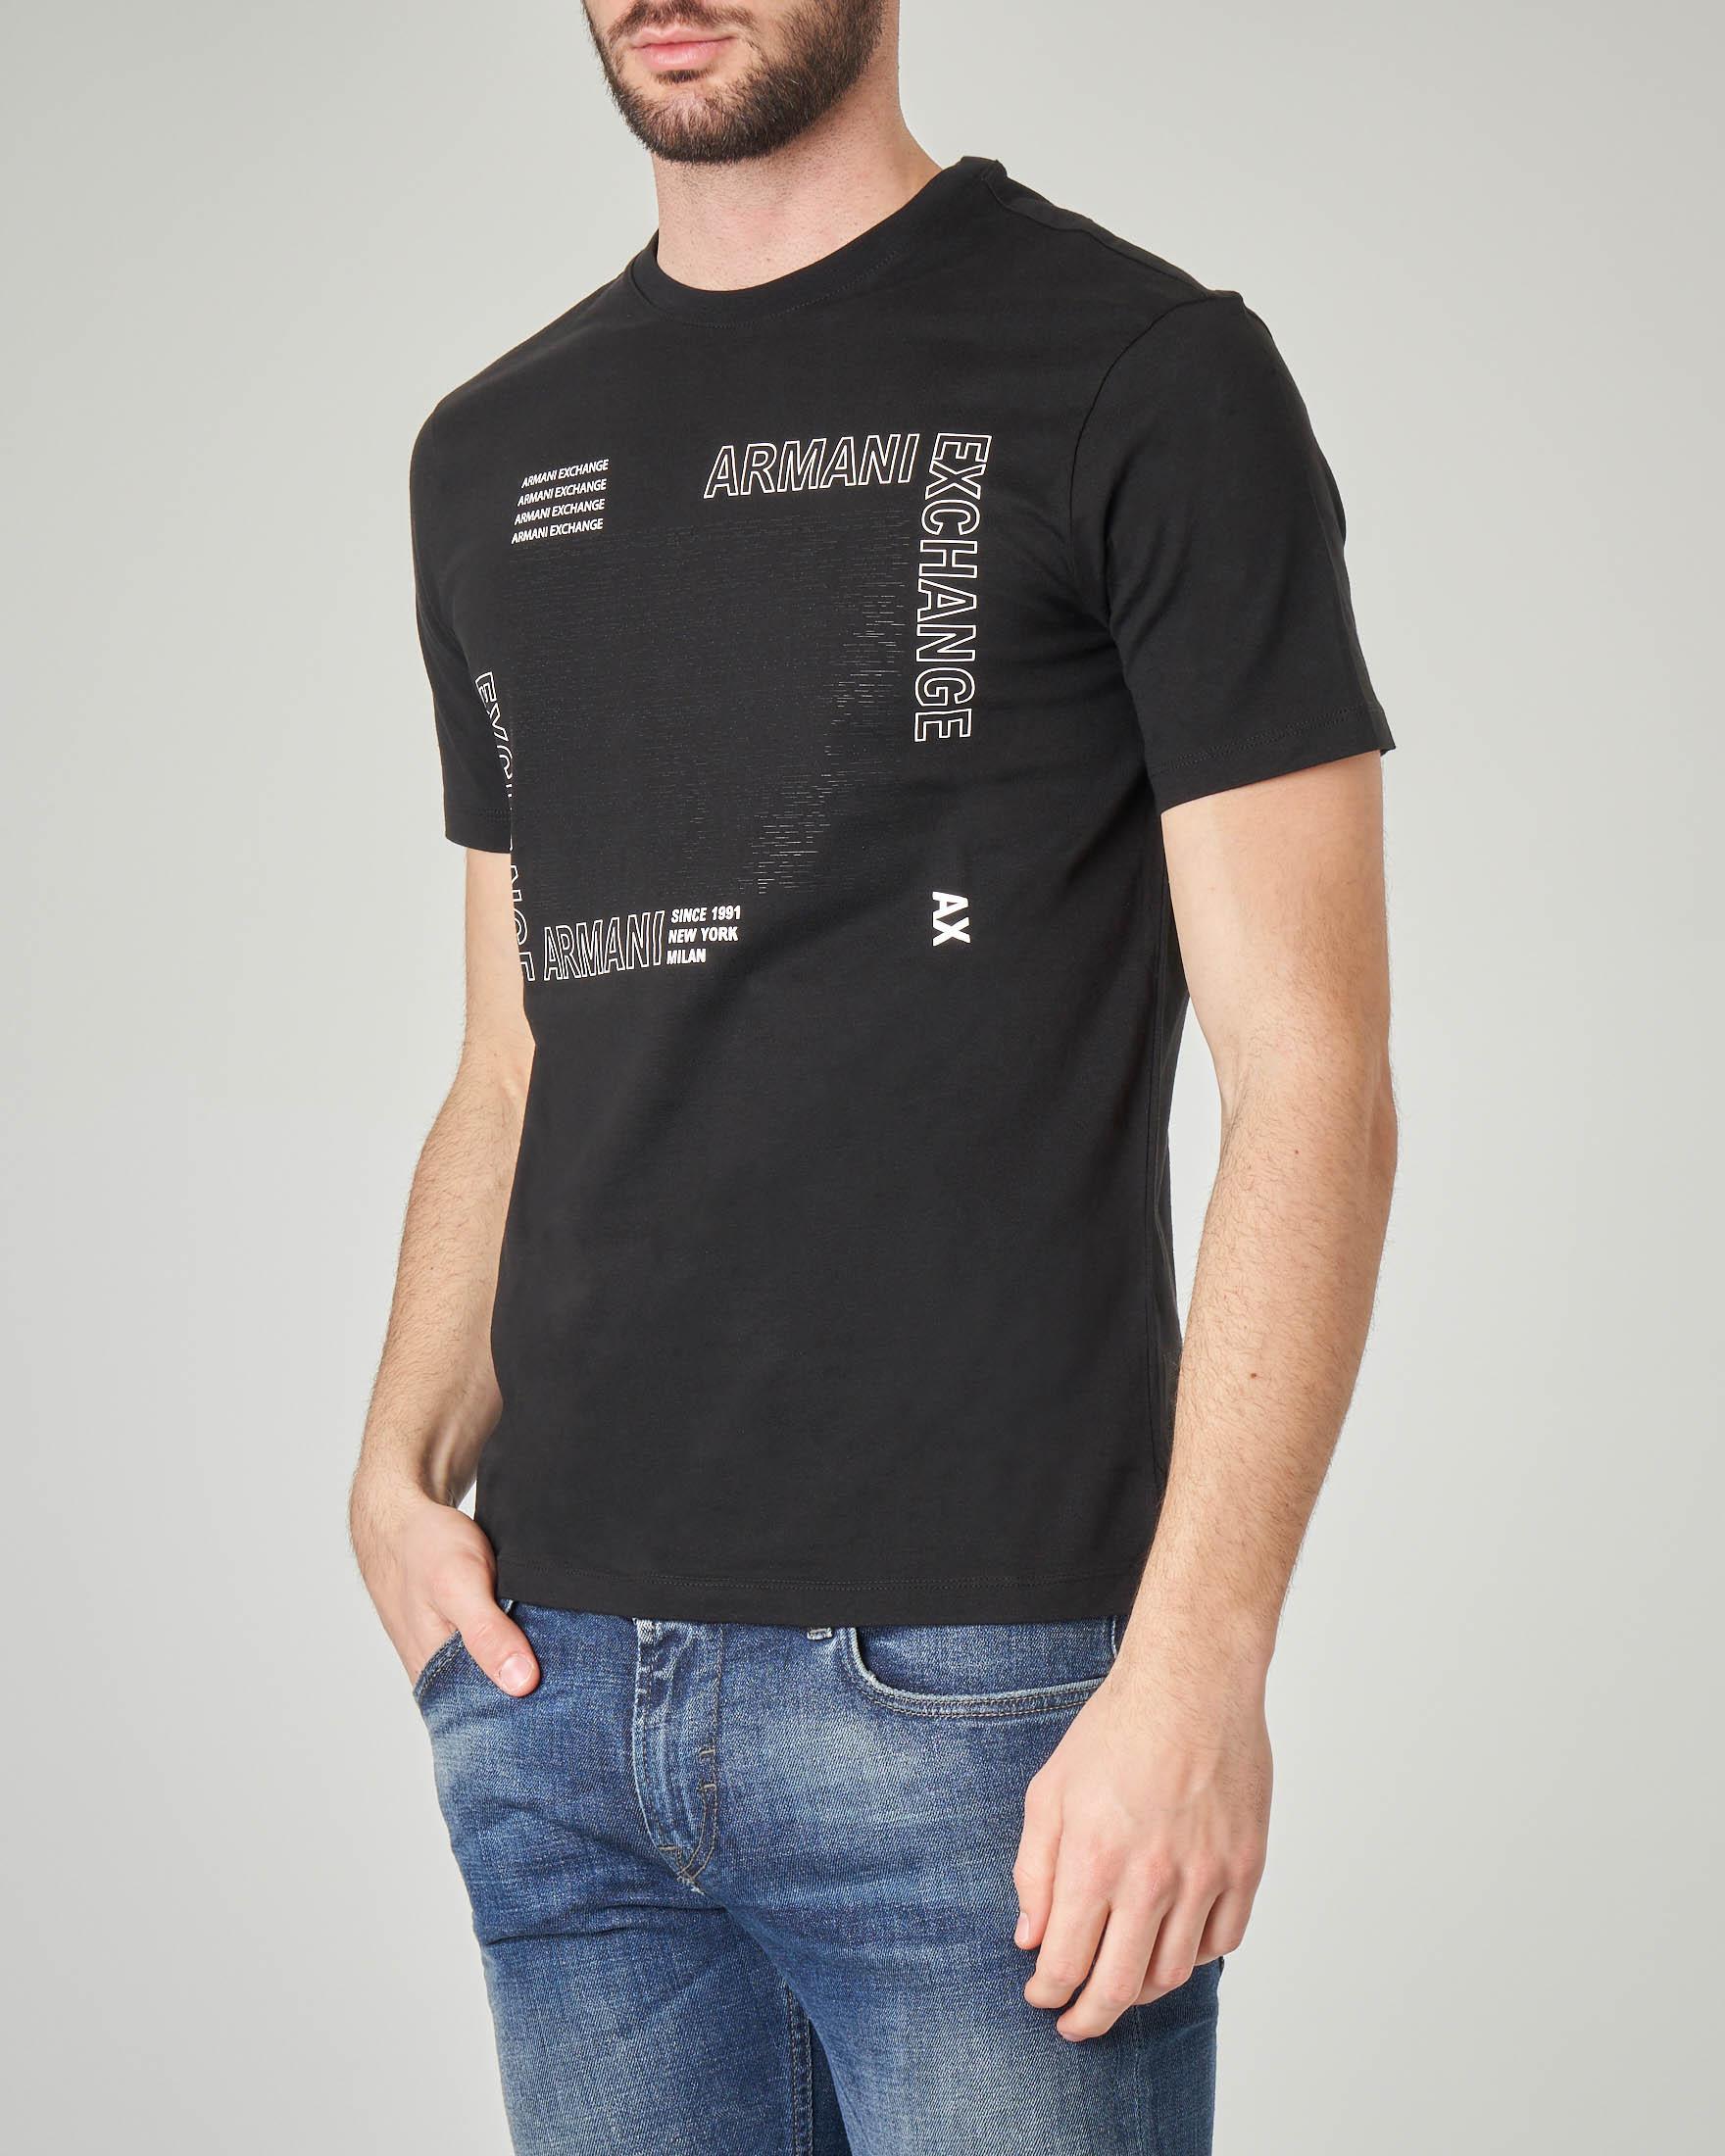 T-shirt nera con stampa logata